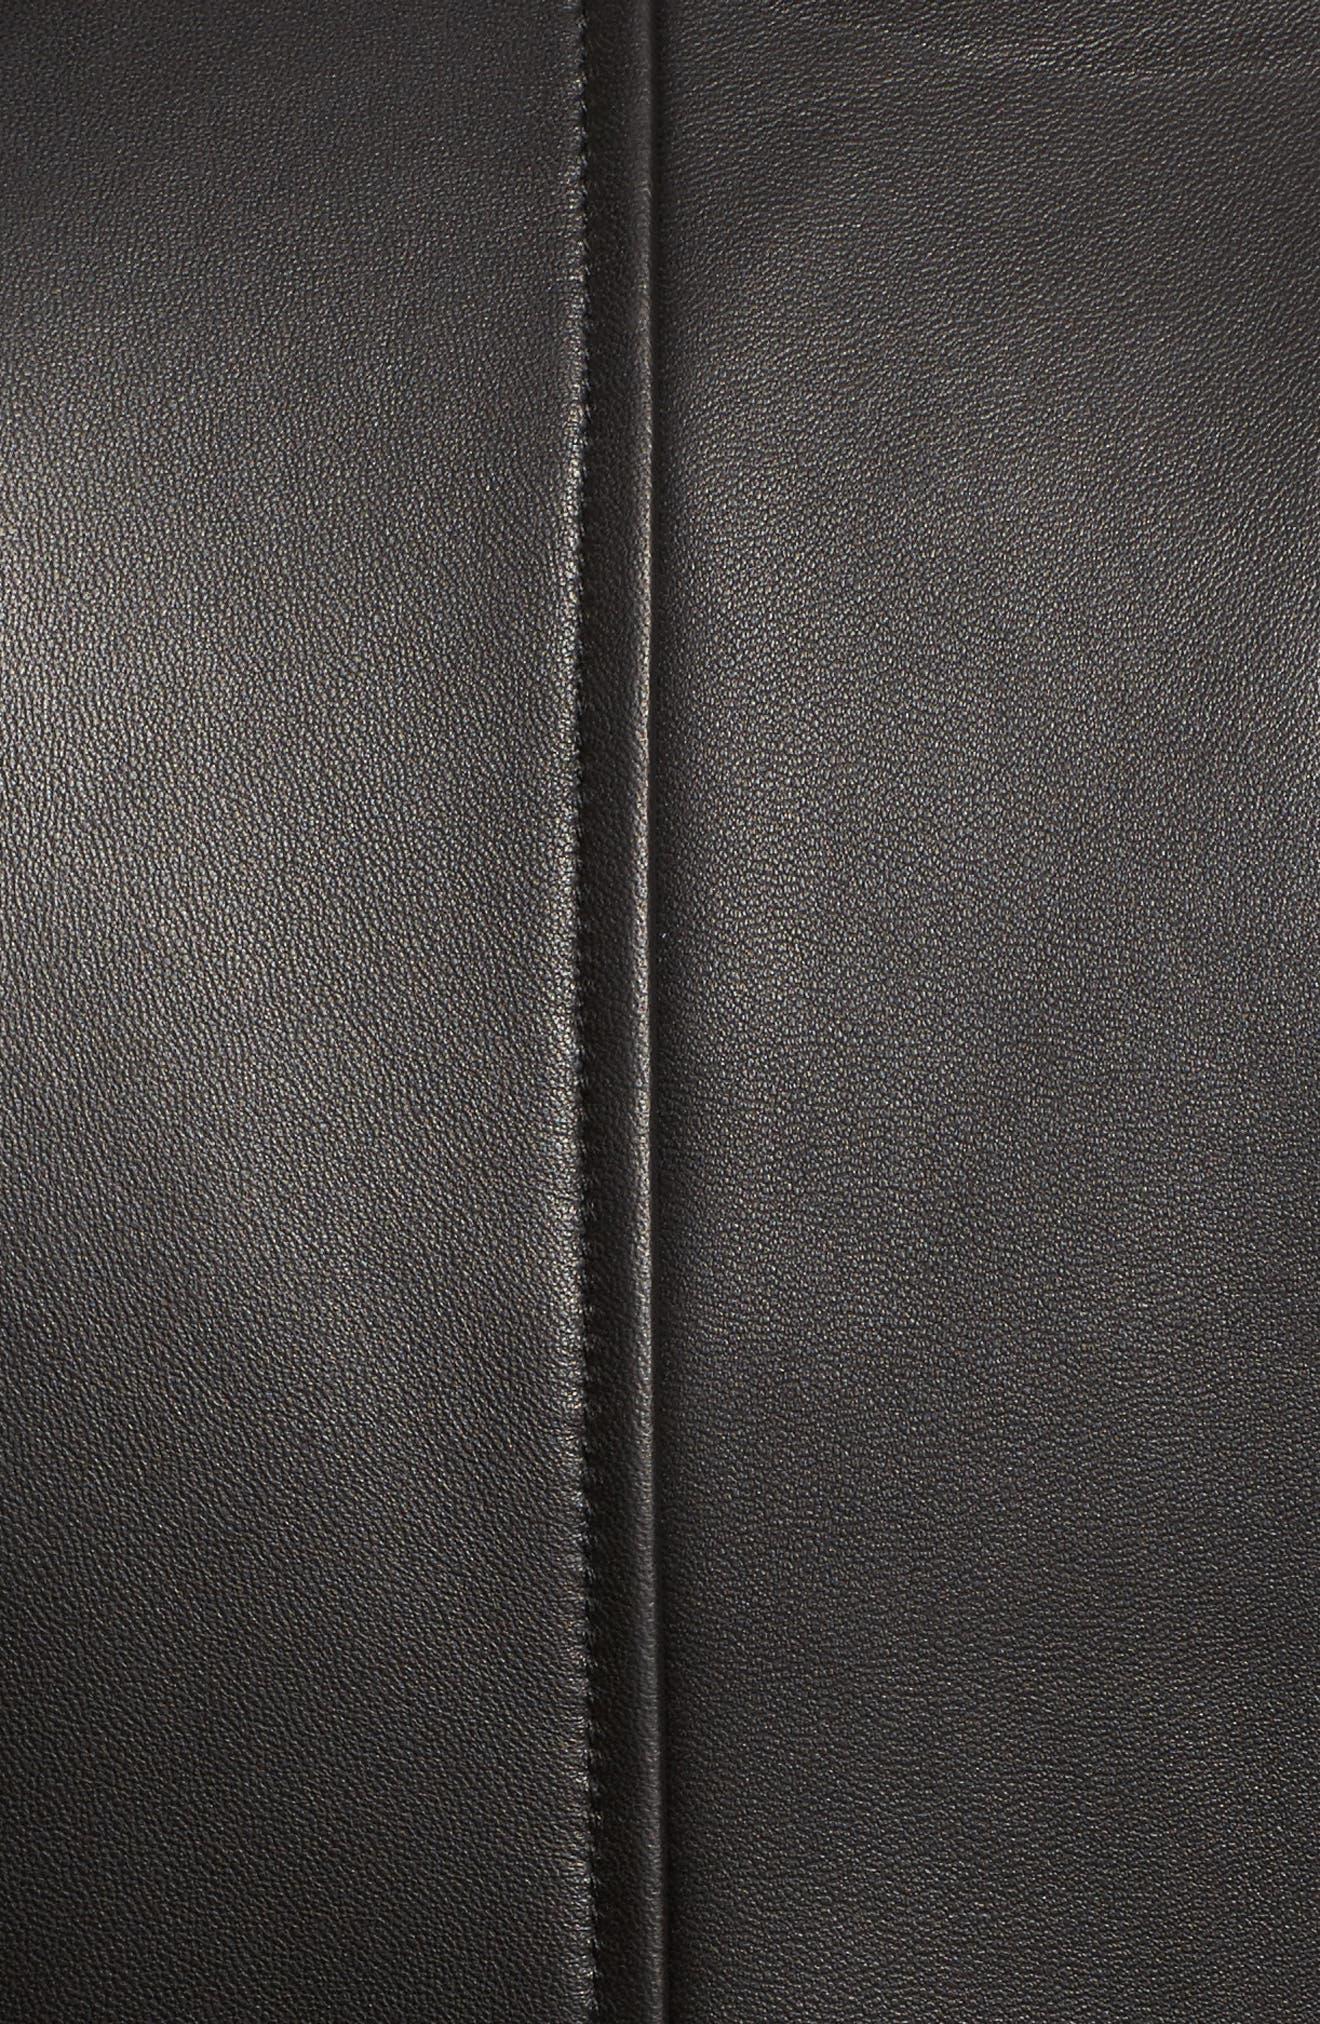 Chevron Seam Leather Jacket,                             Alternate thumbnail 6, color,                             001